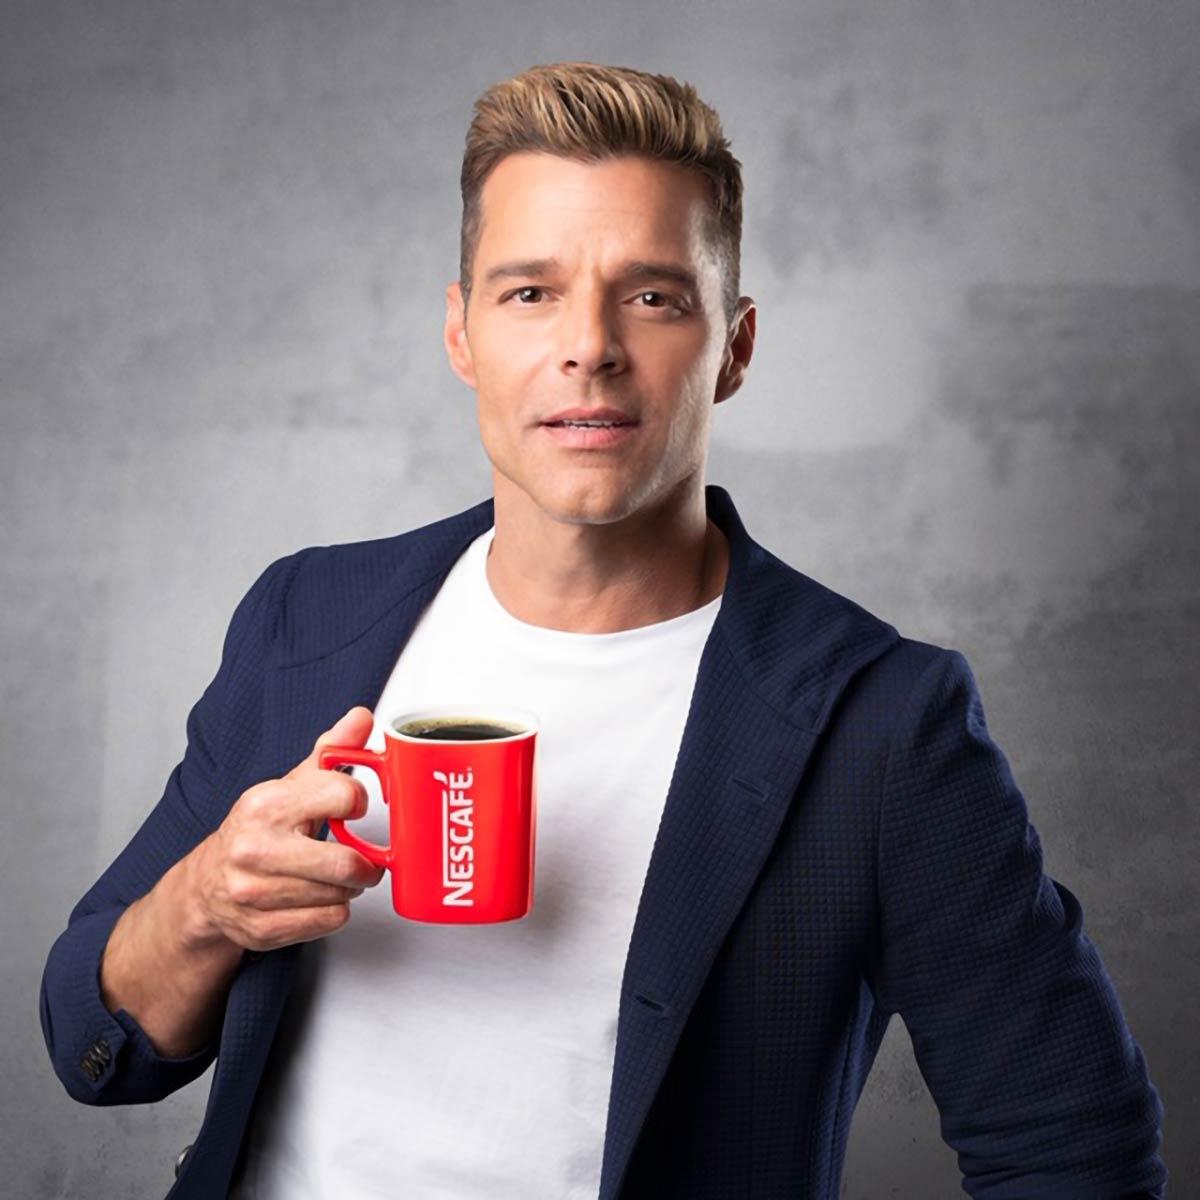 Nescafè - Ricky Martin - Grooming by Massimo Serini